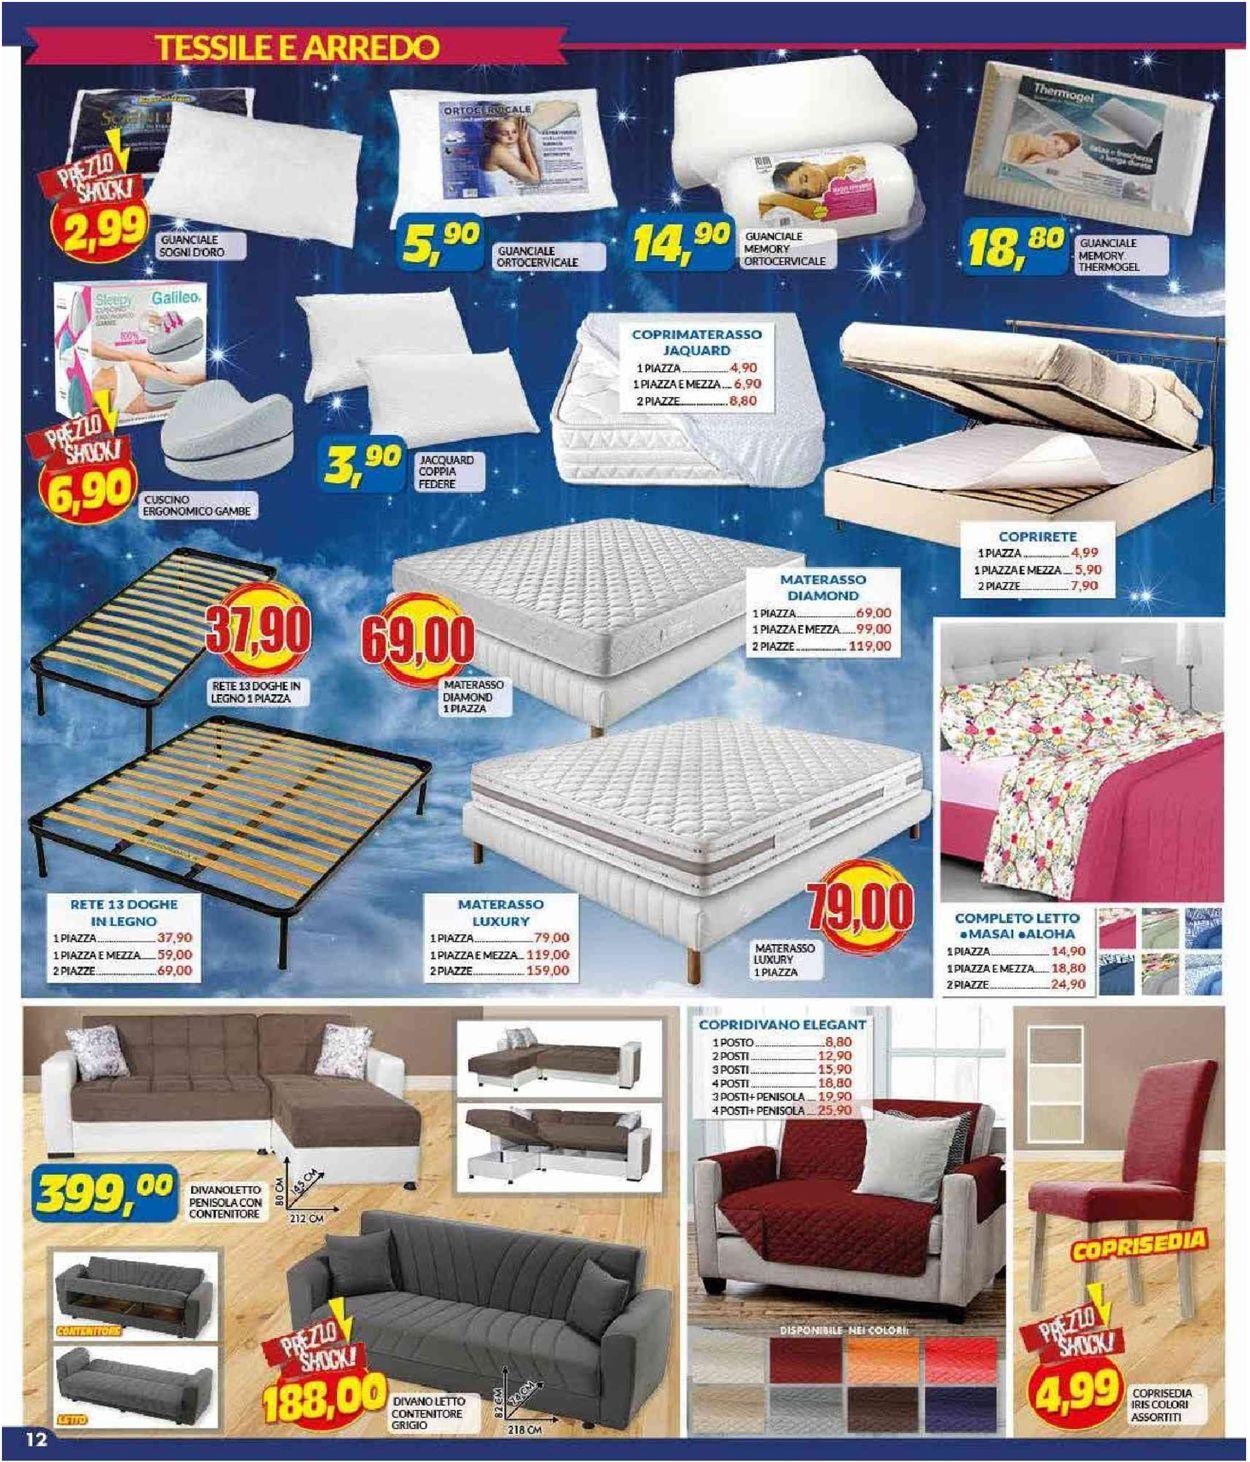 Volantino Risparmio Casa - Offerte 14/04-28/04/2021 (Pagina 12)